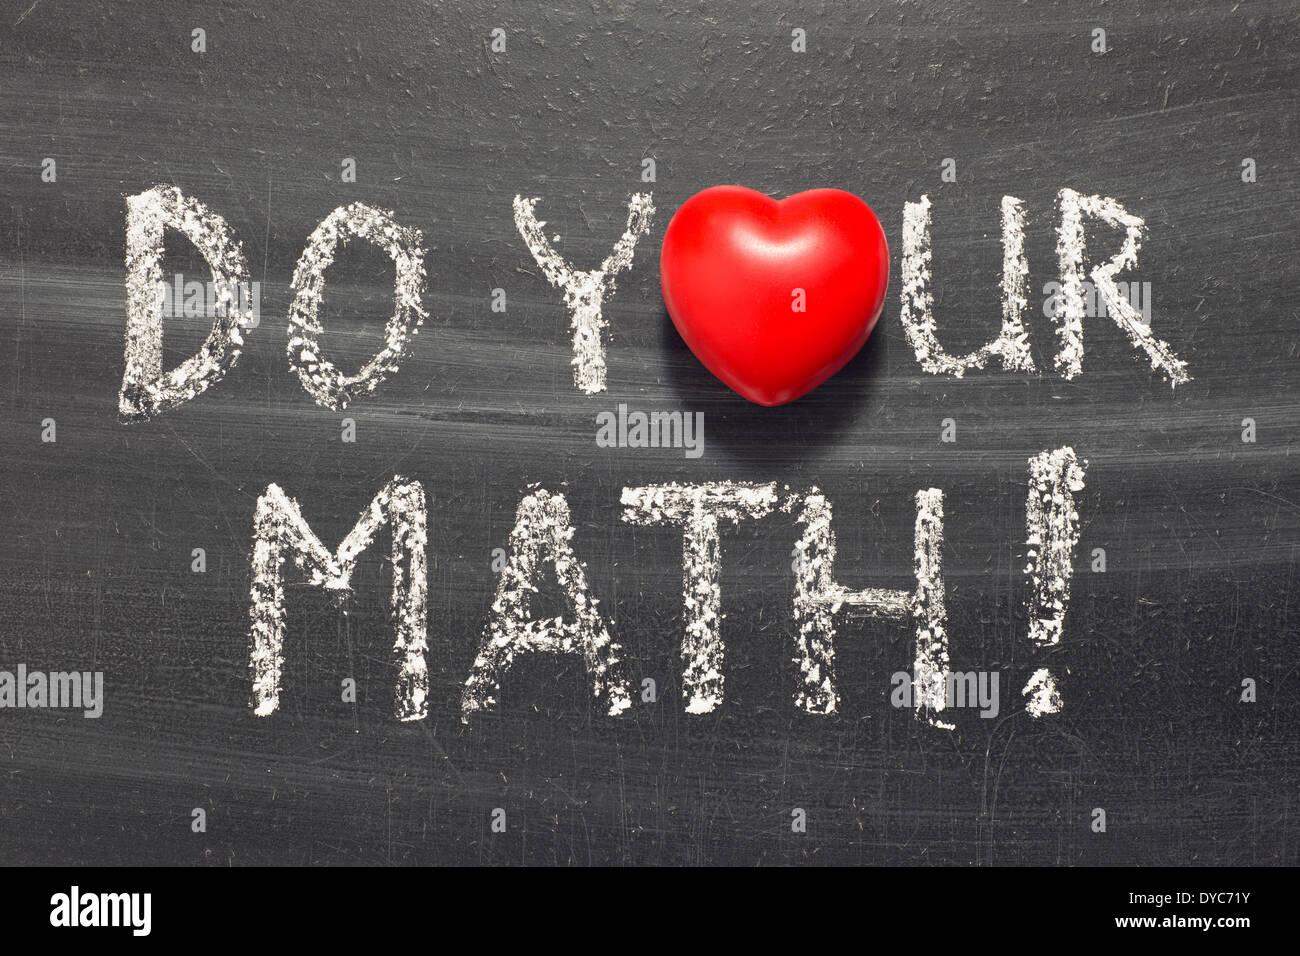 Math Homework Stockfotos & Math Homework Bilder - Alamy